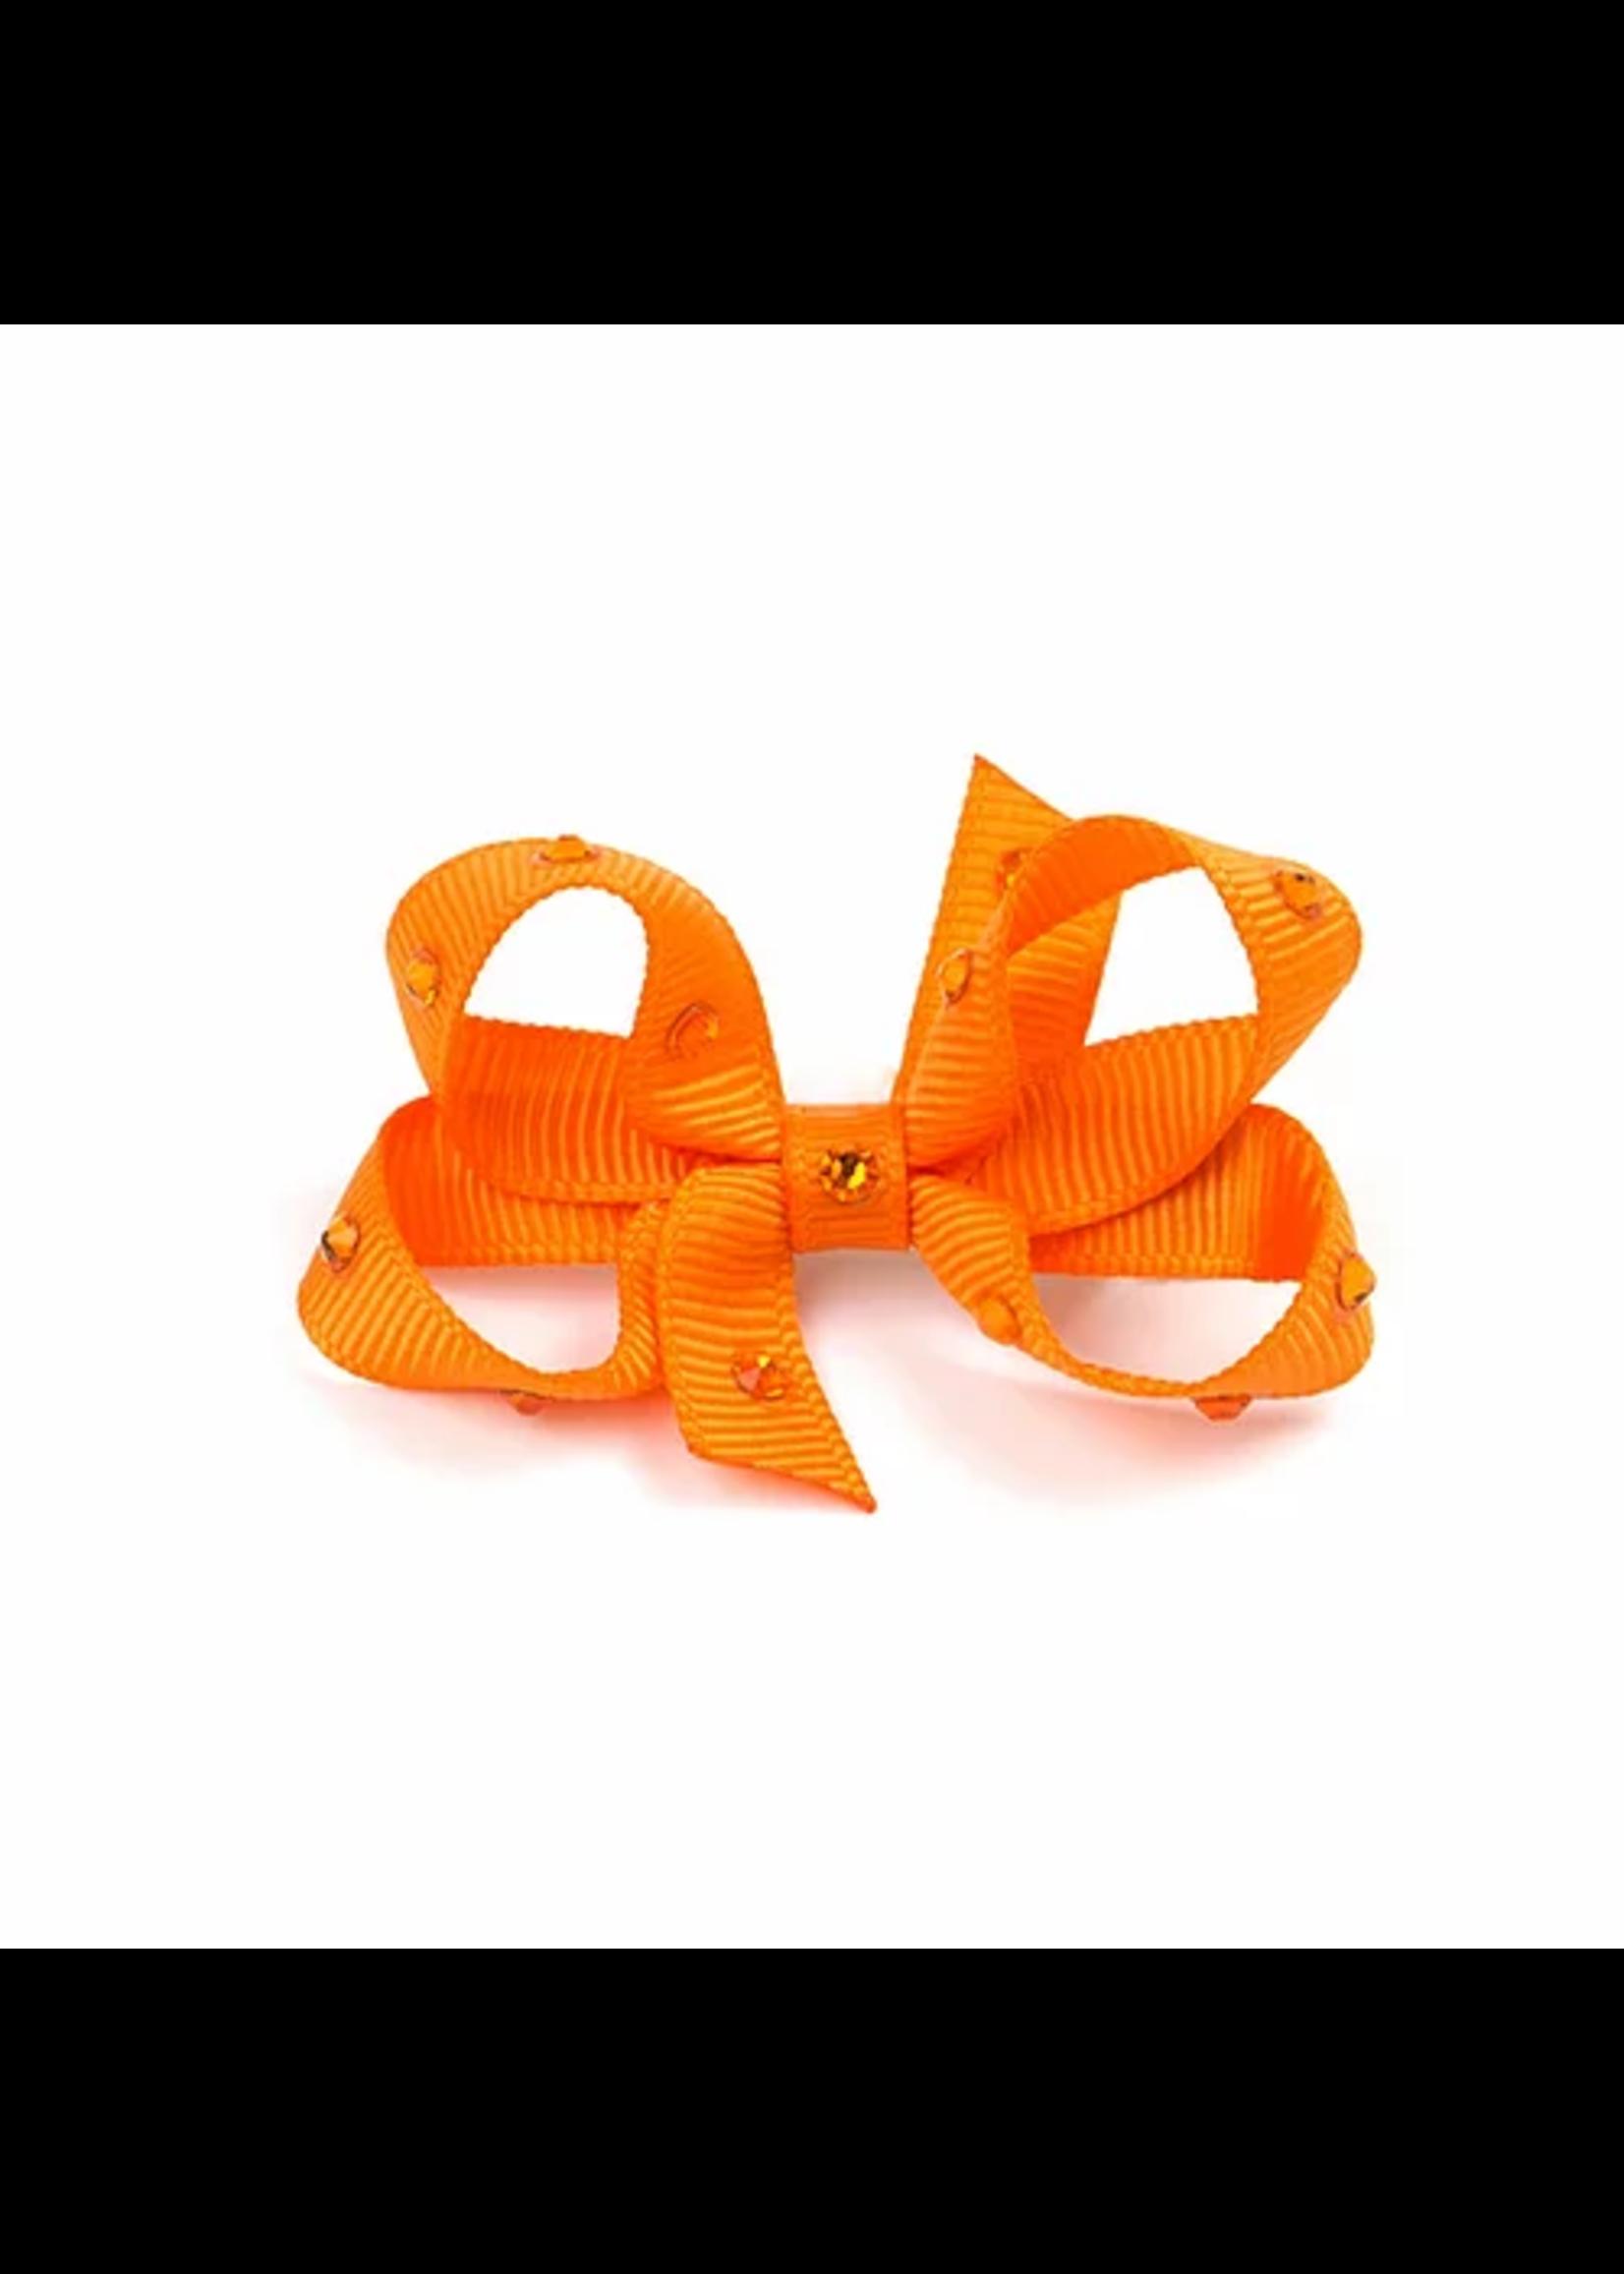 Olilia Small Crystal Bow (Tangerine)